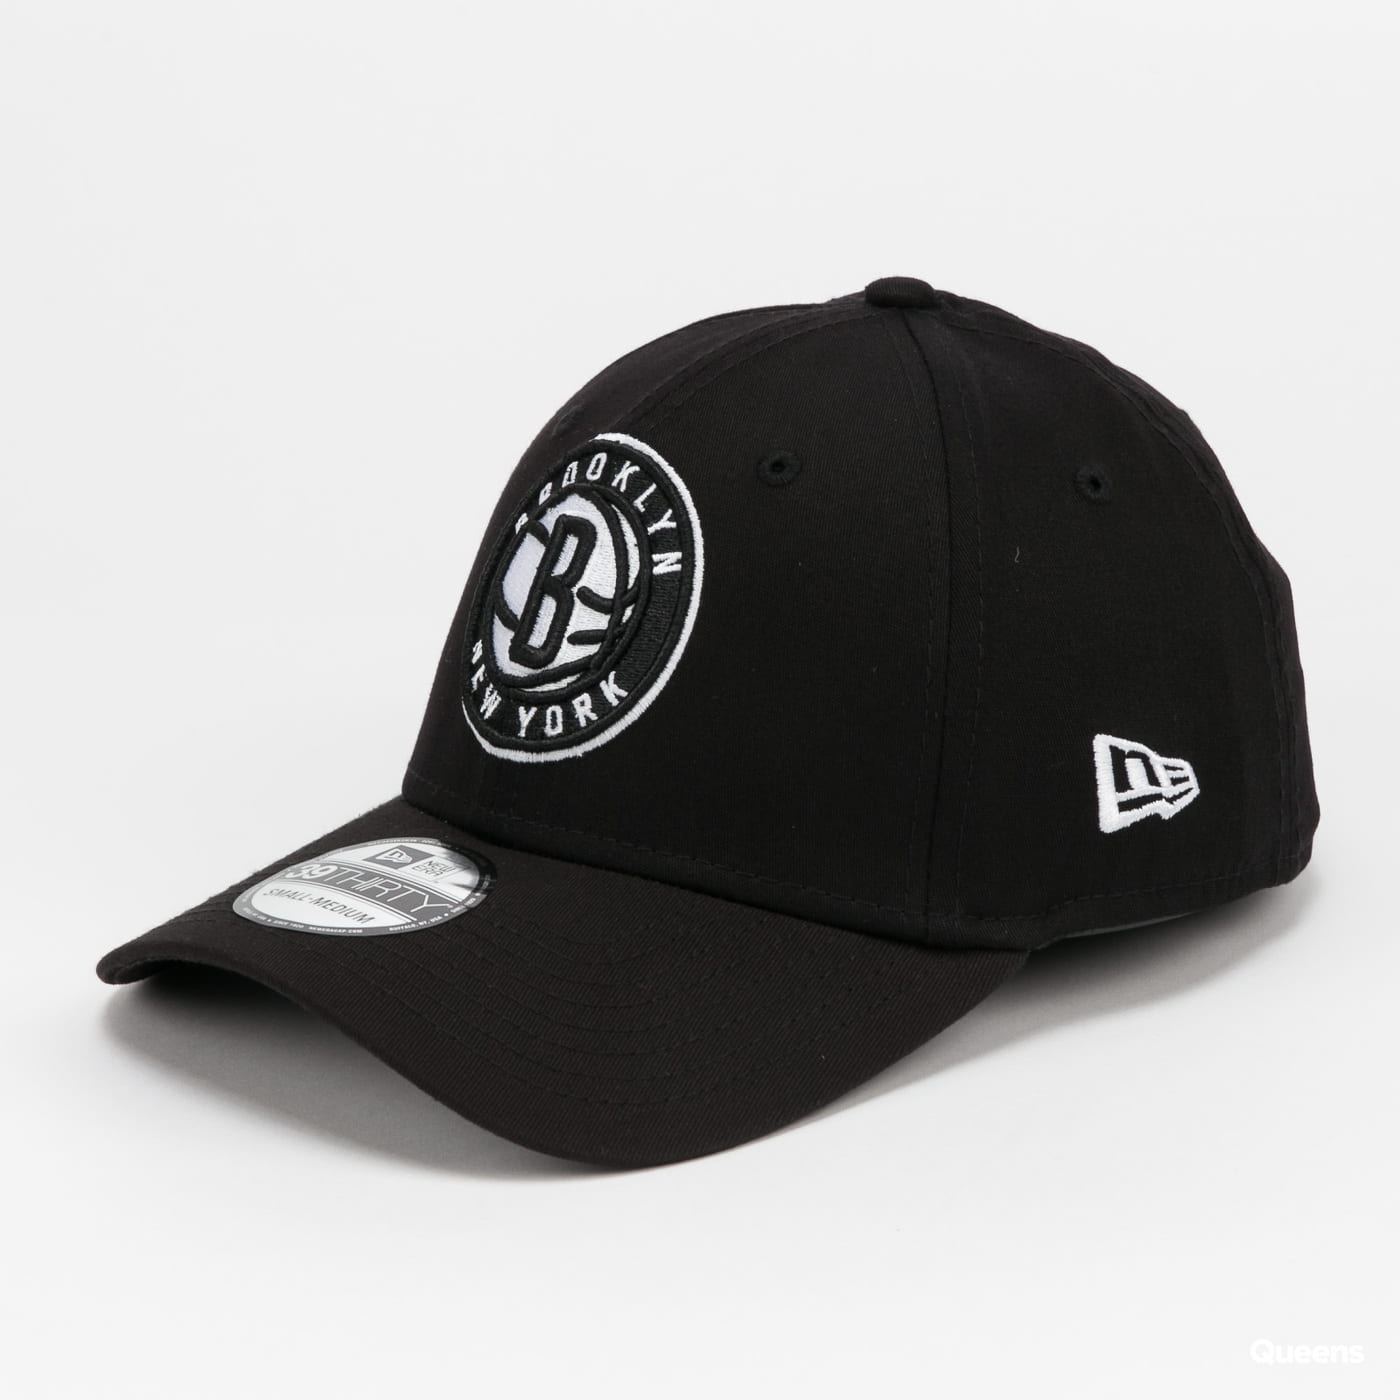 New Era 3930 NBA Core Brooklyn NY gray / beige / pink / black